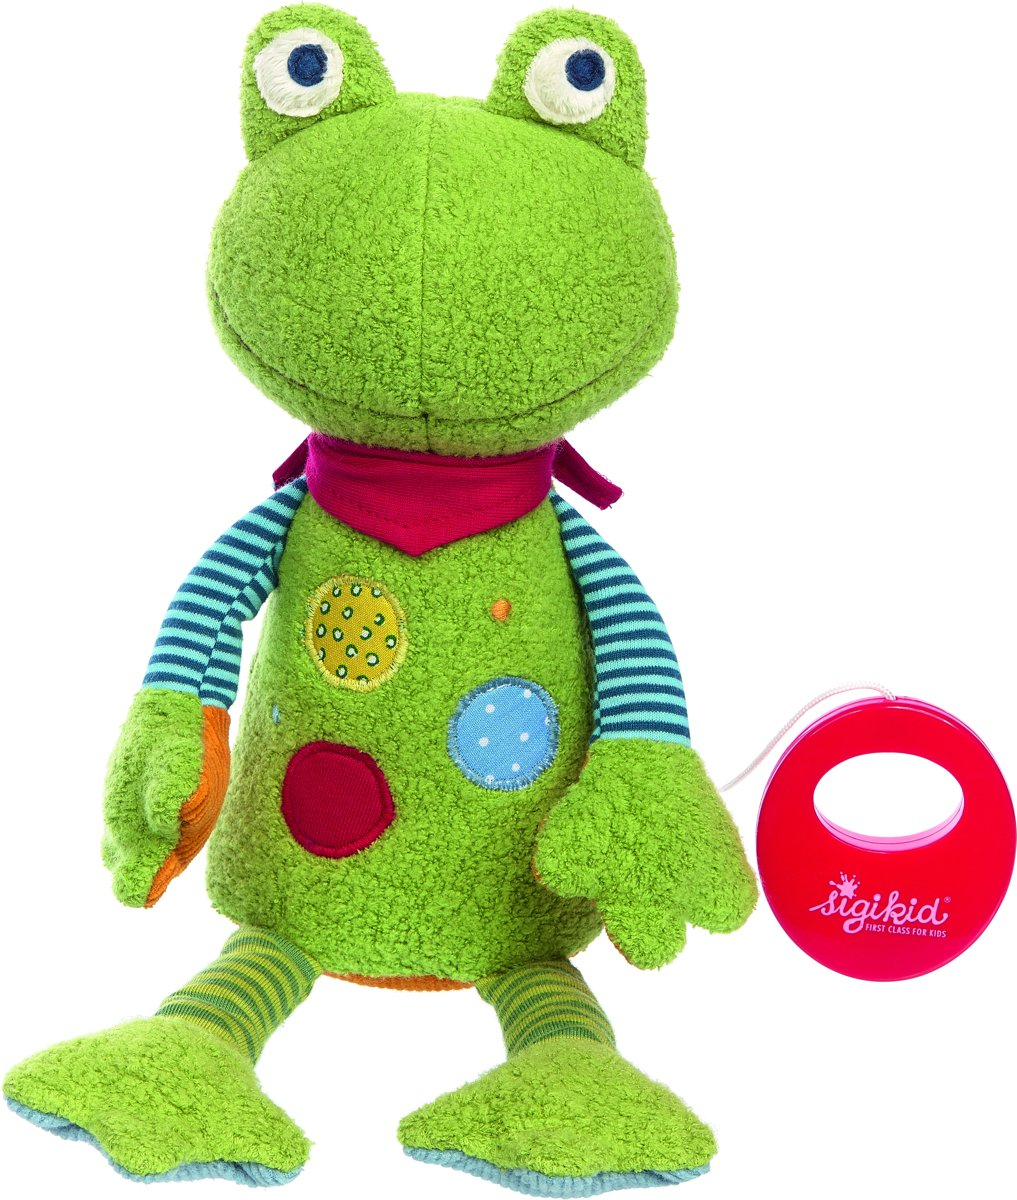 sigikid Musical frog, Flecken Frog 39150 kopen